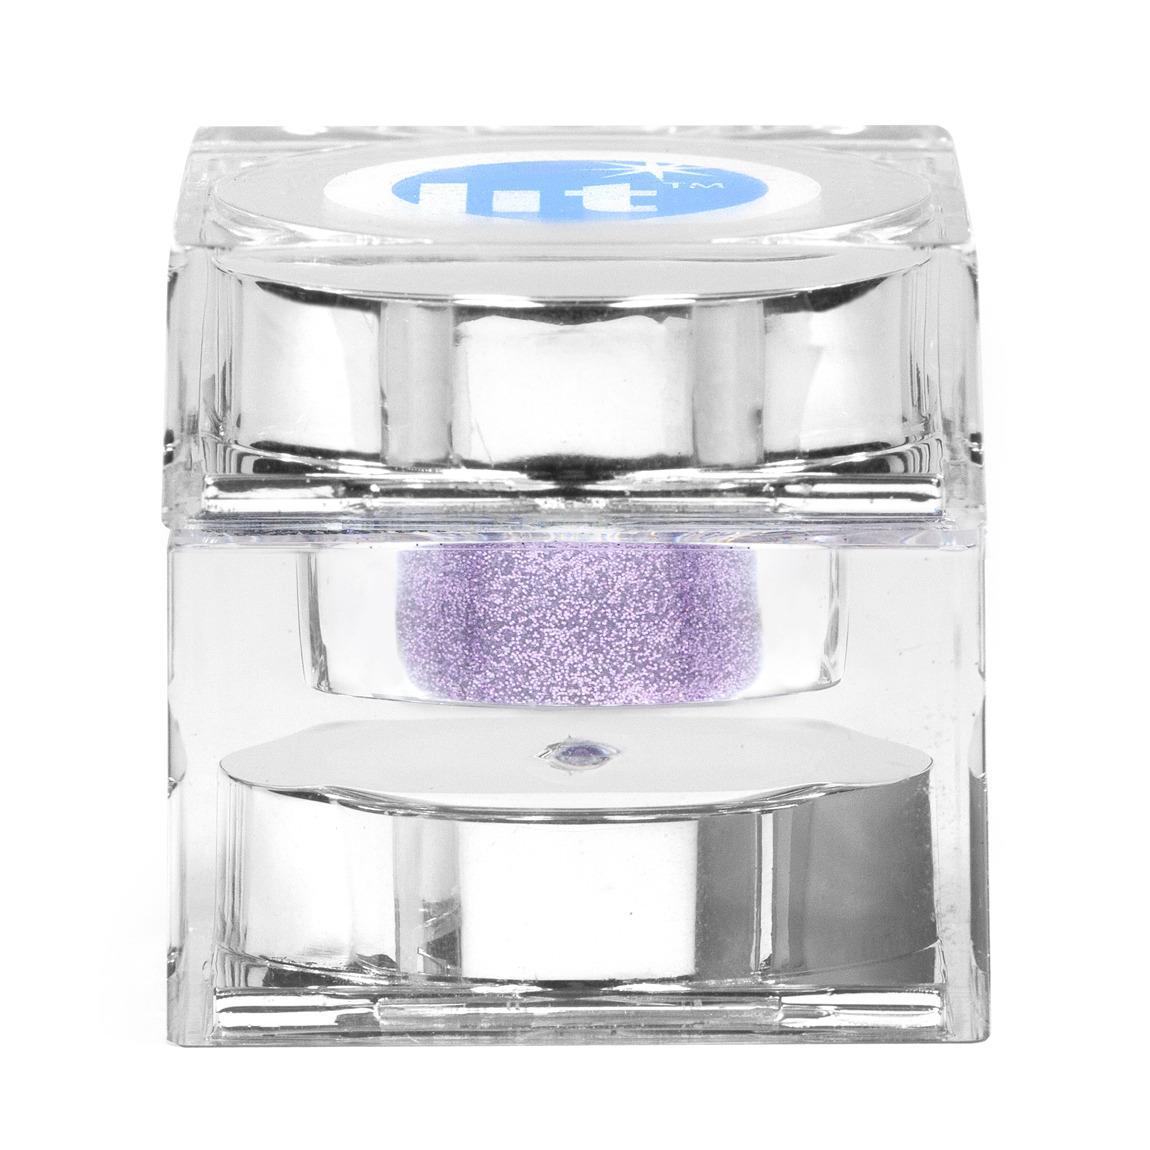 Lit Cosmetics Lit Glitter Twisted Sistah S2 (Solid)